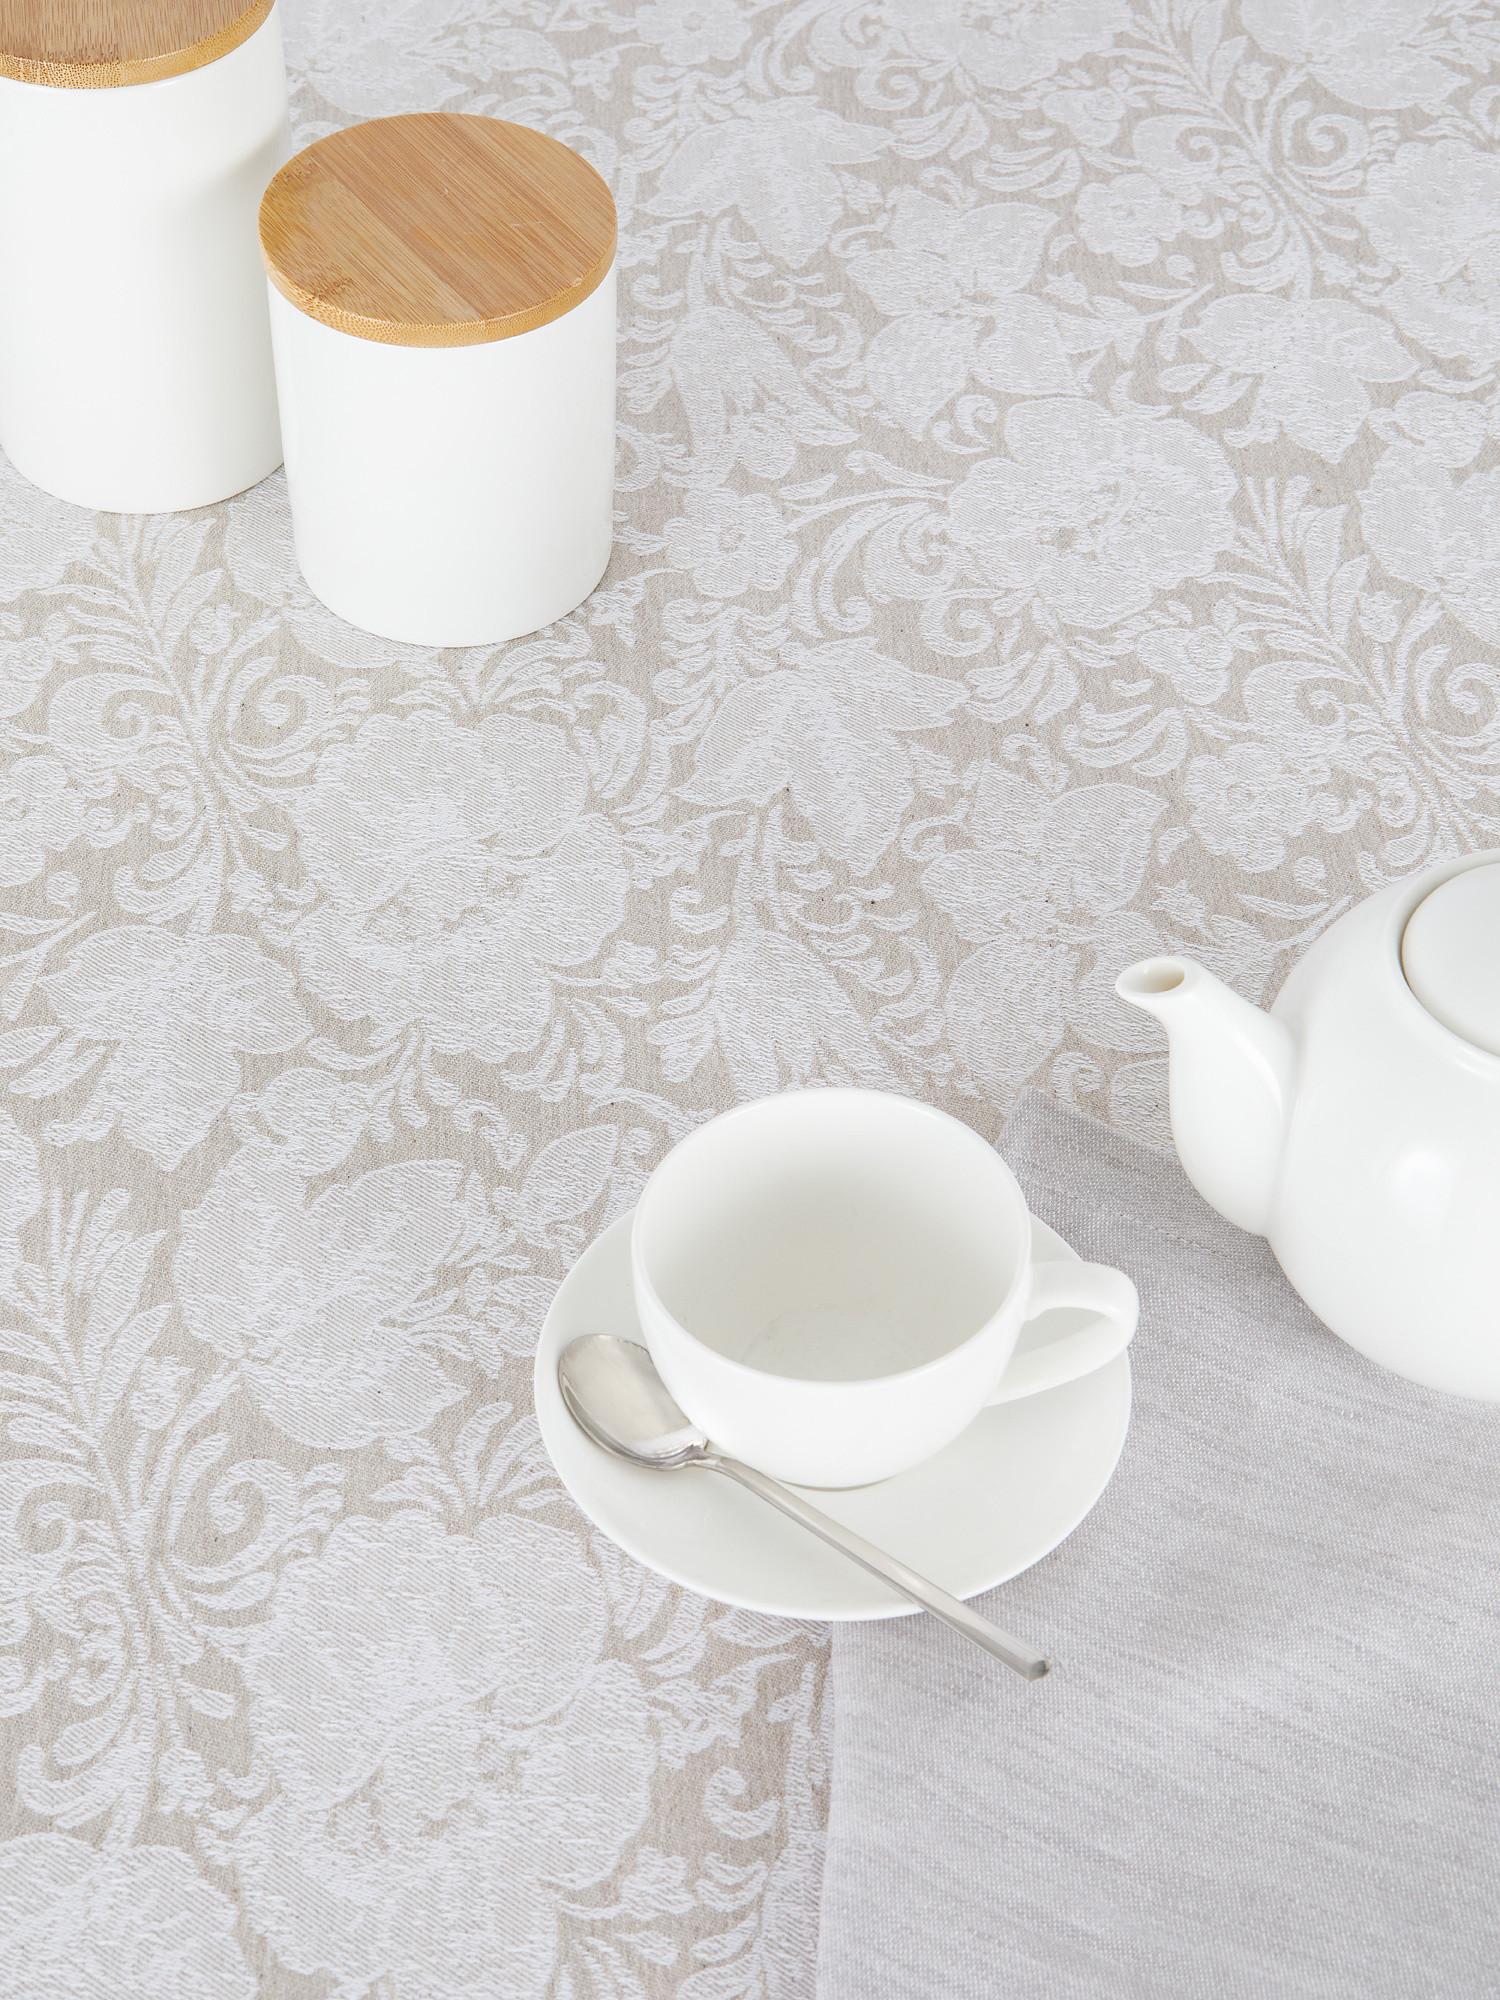 Tovaglia centrotavola lino e cotone motivo ornamentale, Bianco, large image number 1